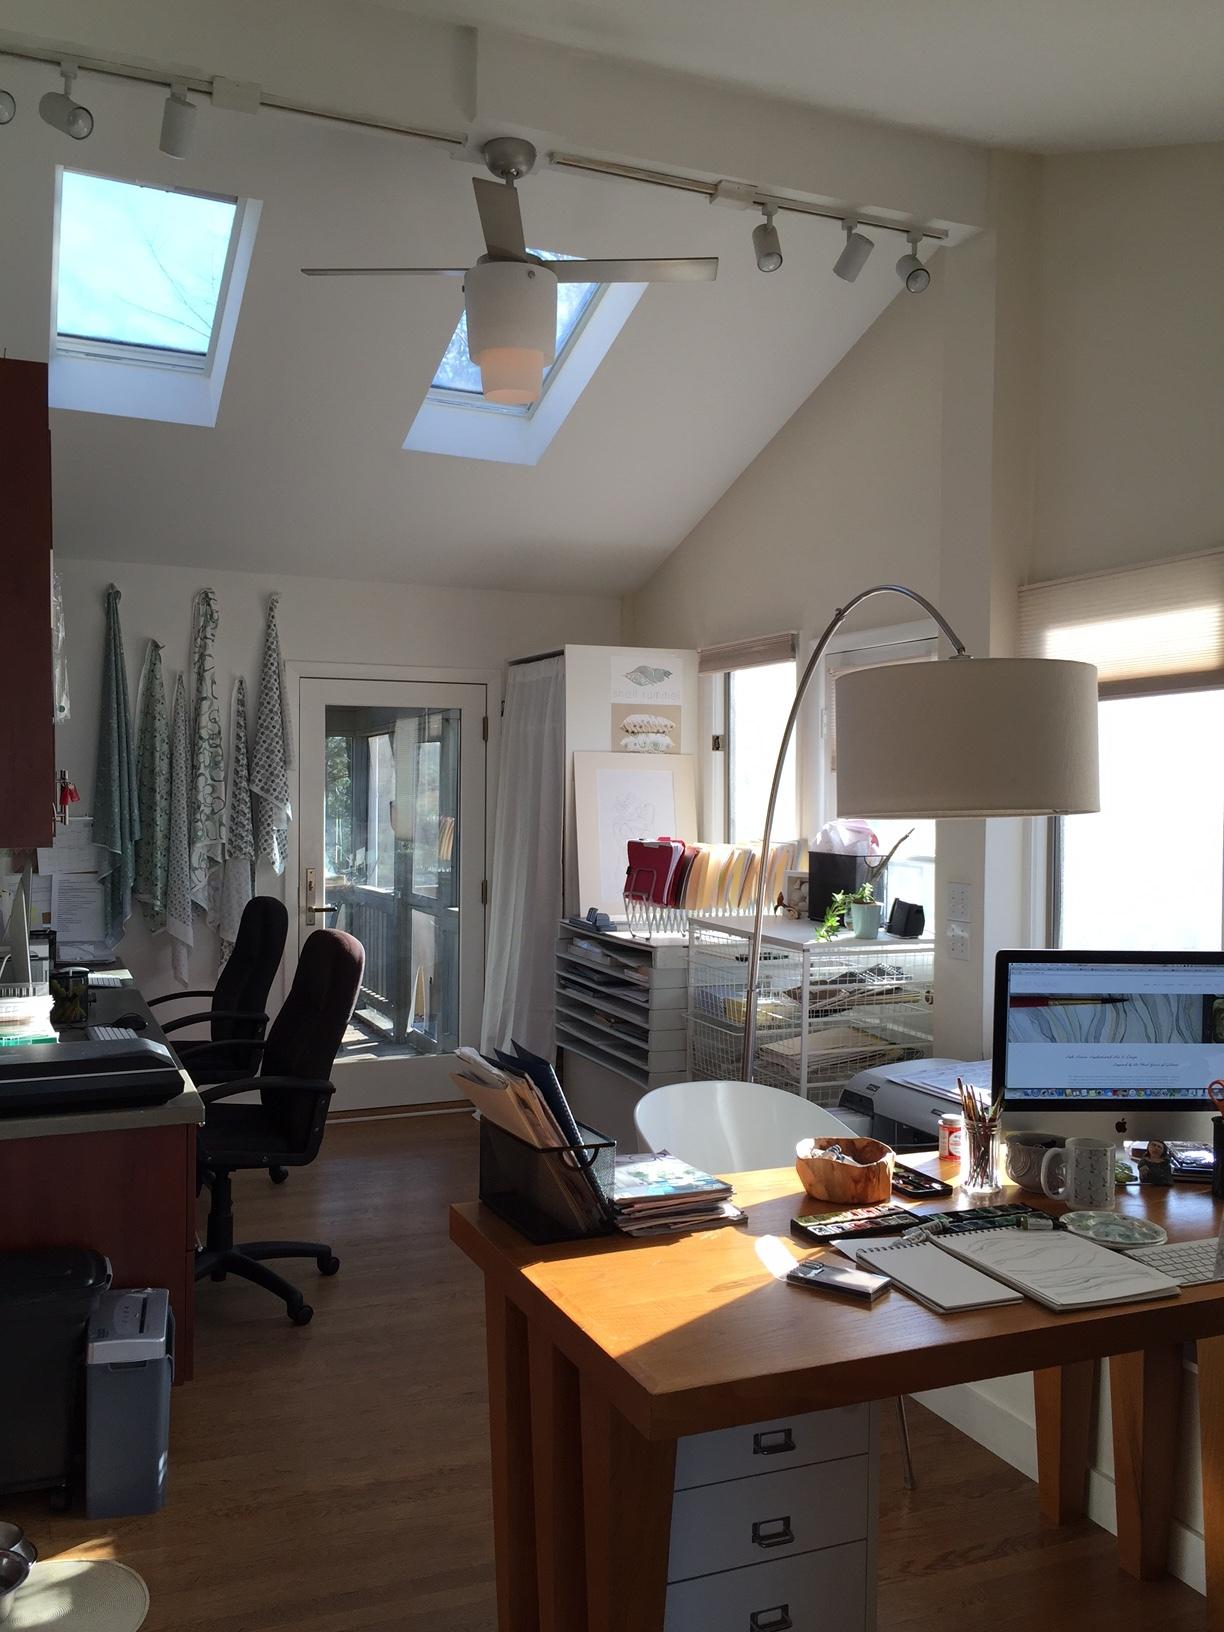 Shell Rummel art and design studio